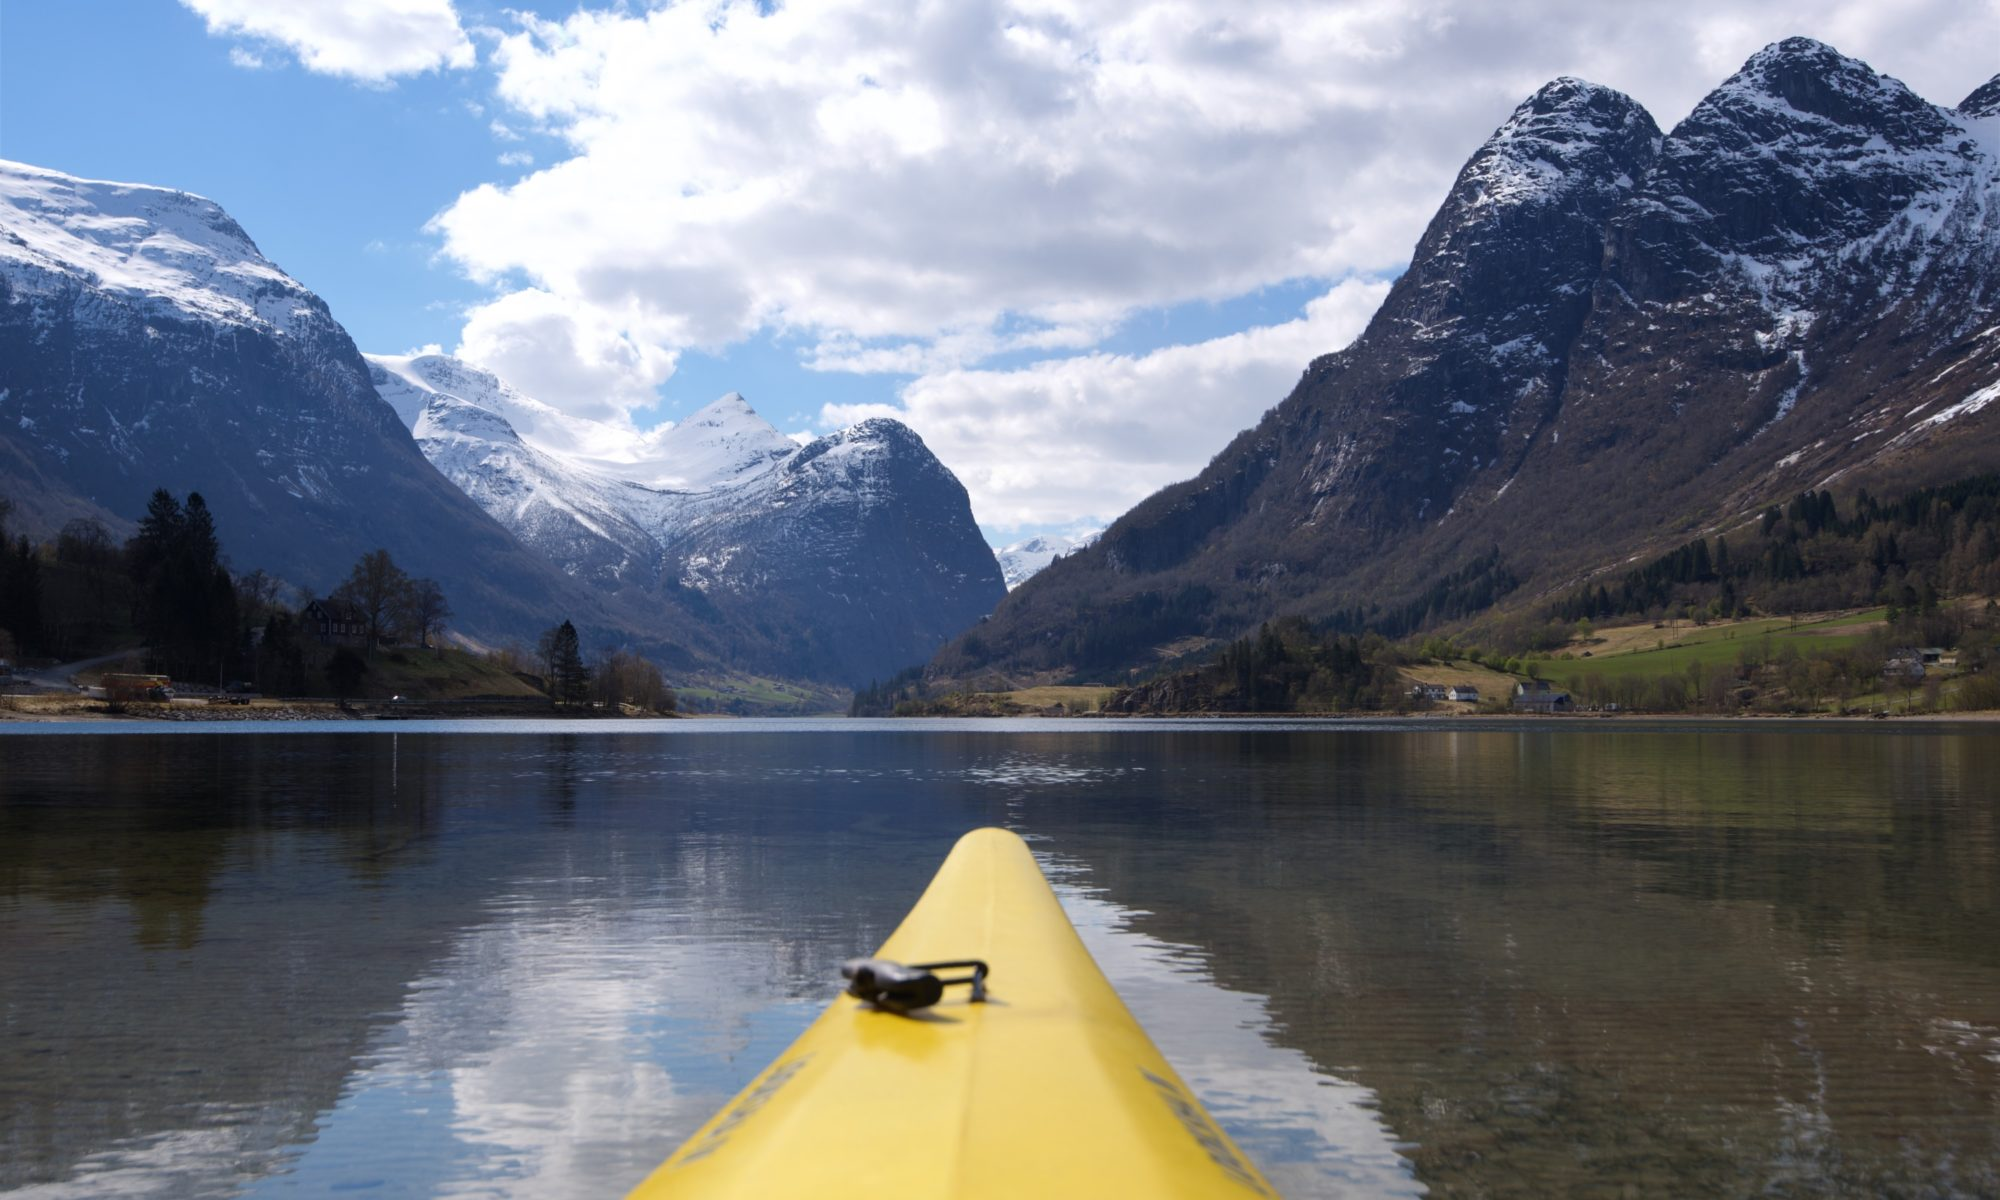 FJORDS NORGE - Kajakk på Oldevatnet i Olden, Nordfjord.